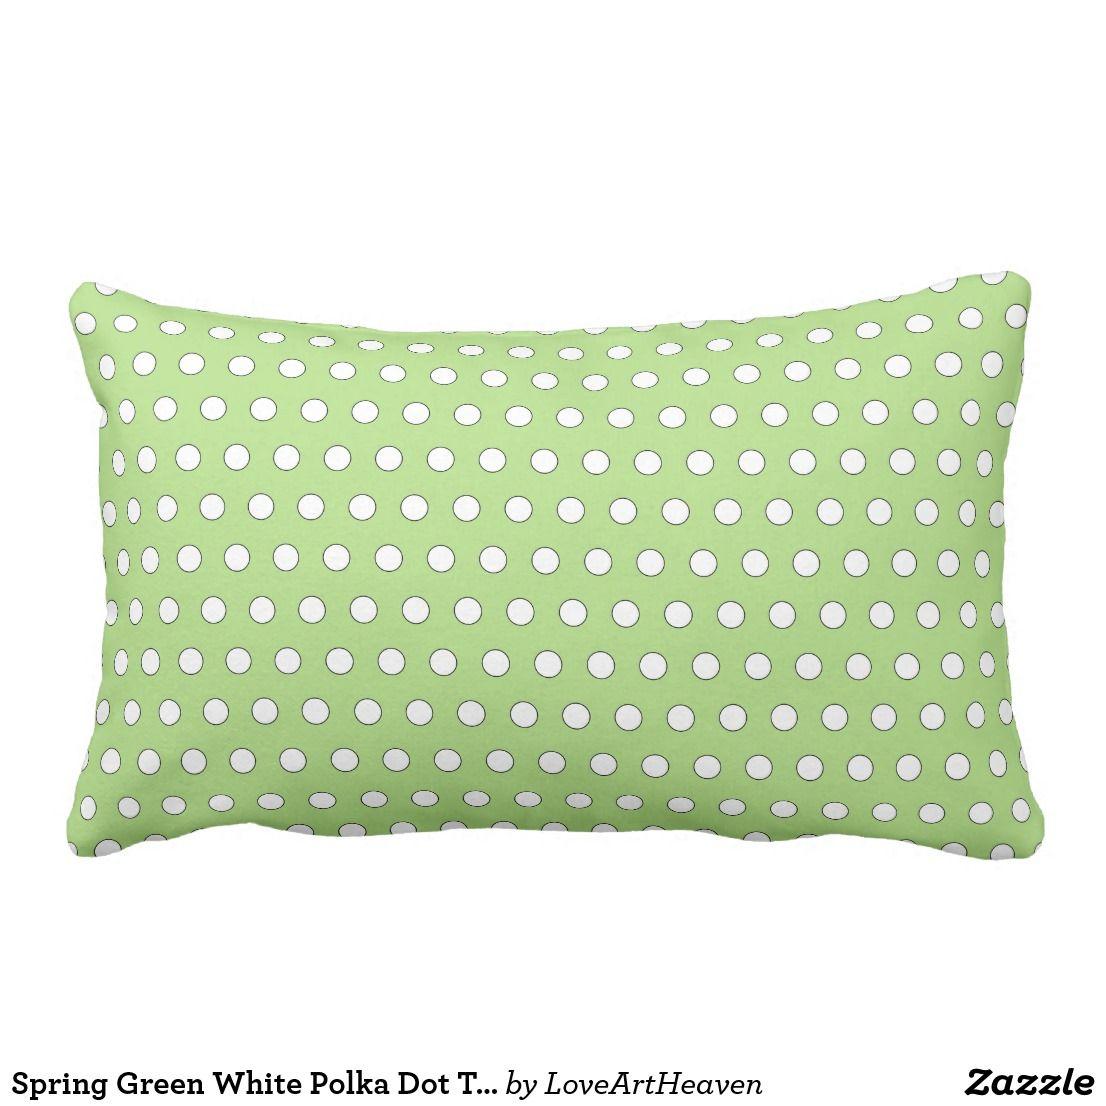 Amazing Spring Green White Polka Dot Throw Pillow Zazzle Com Machost Co Dining Chair Design Ideas Machostcouk